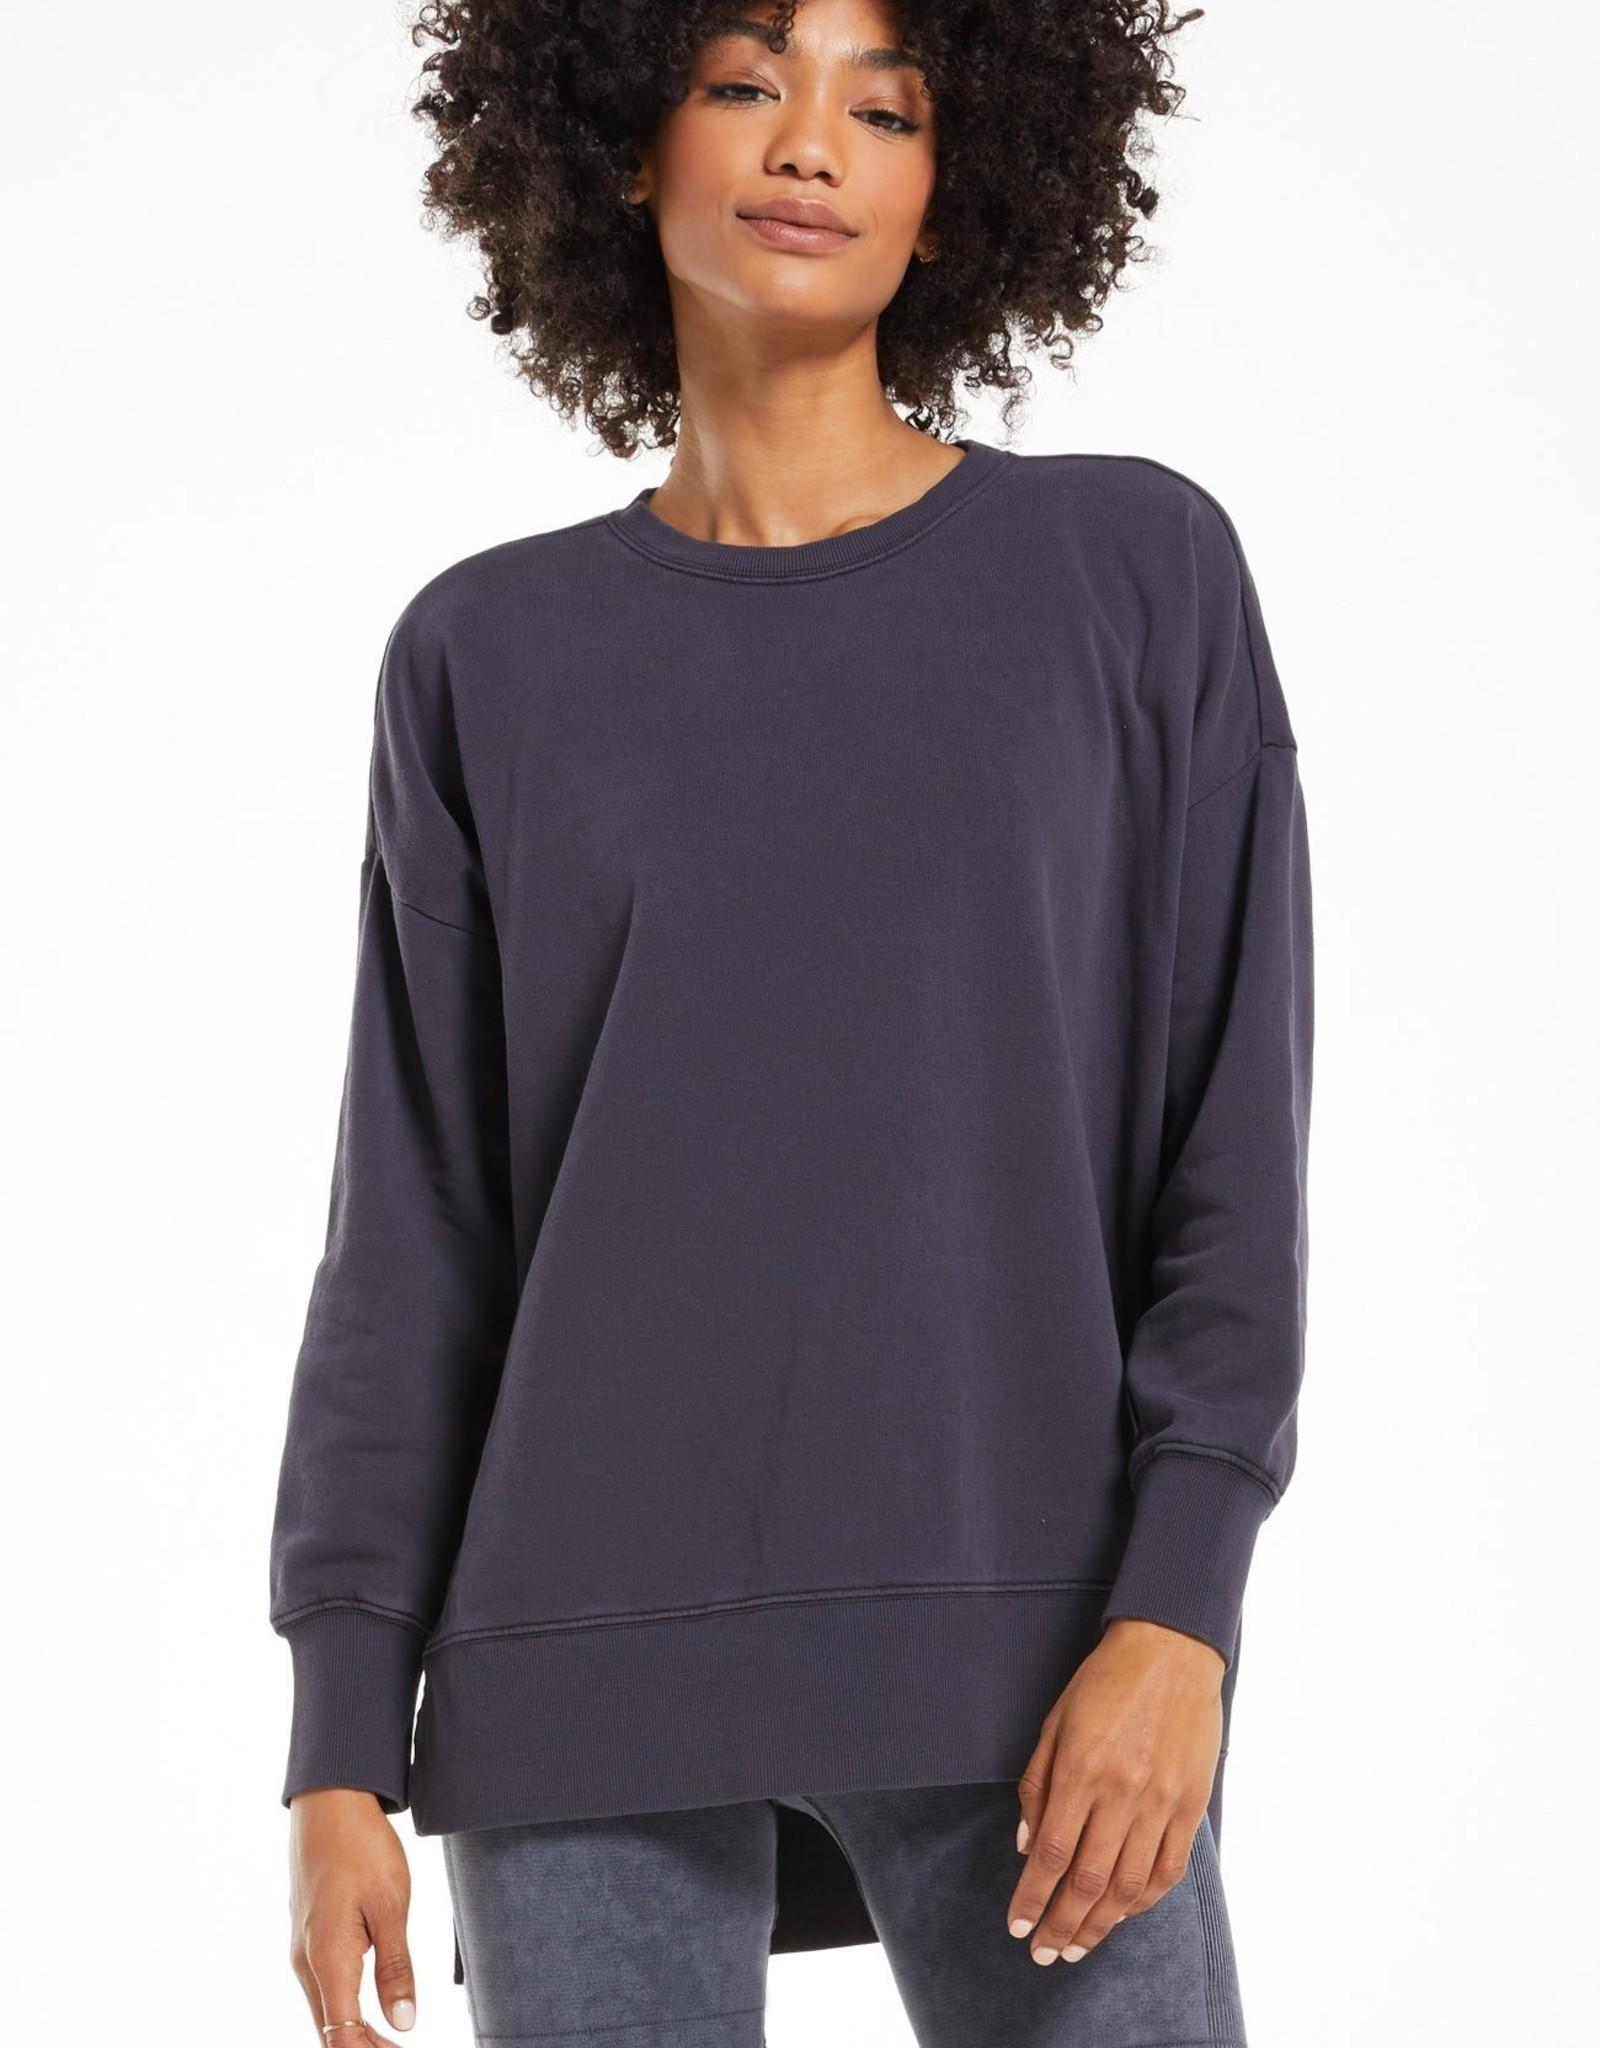 Z Supply Layer Up Sweatshirt